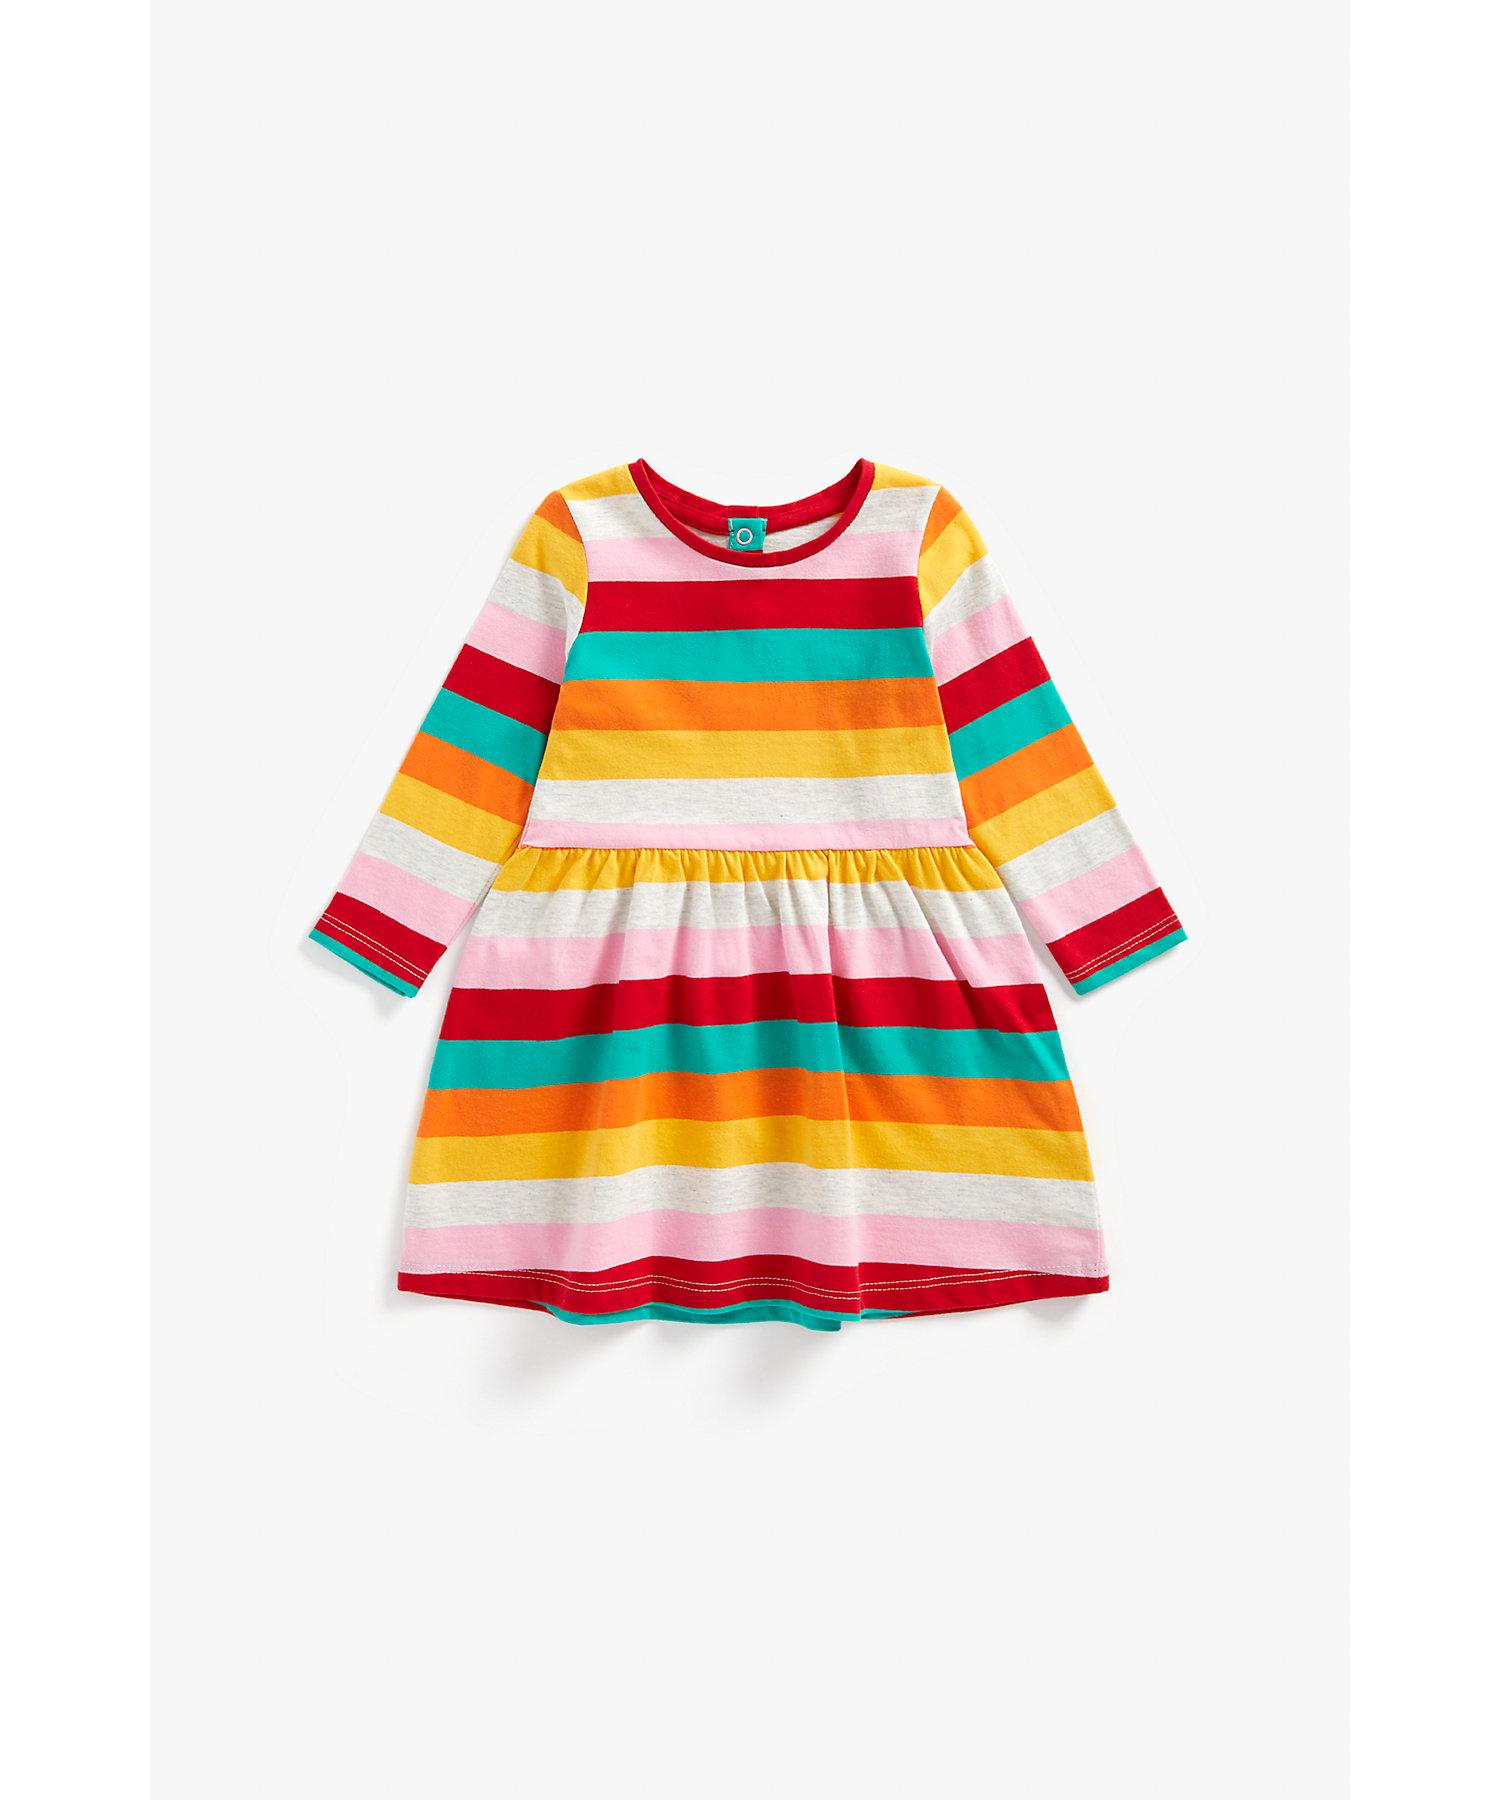 Mothercare   Girls Full Sleeves Dress Rainbow Stripes - Multicolor